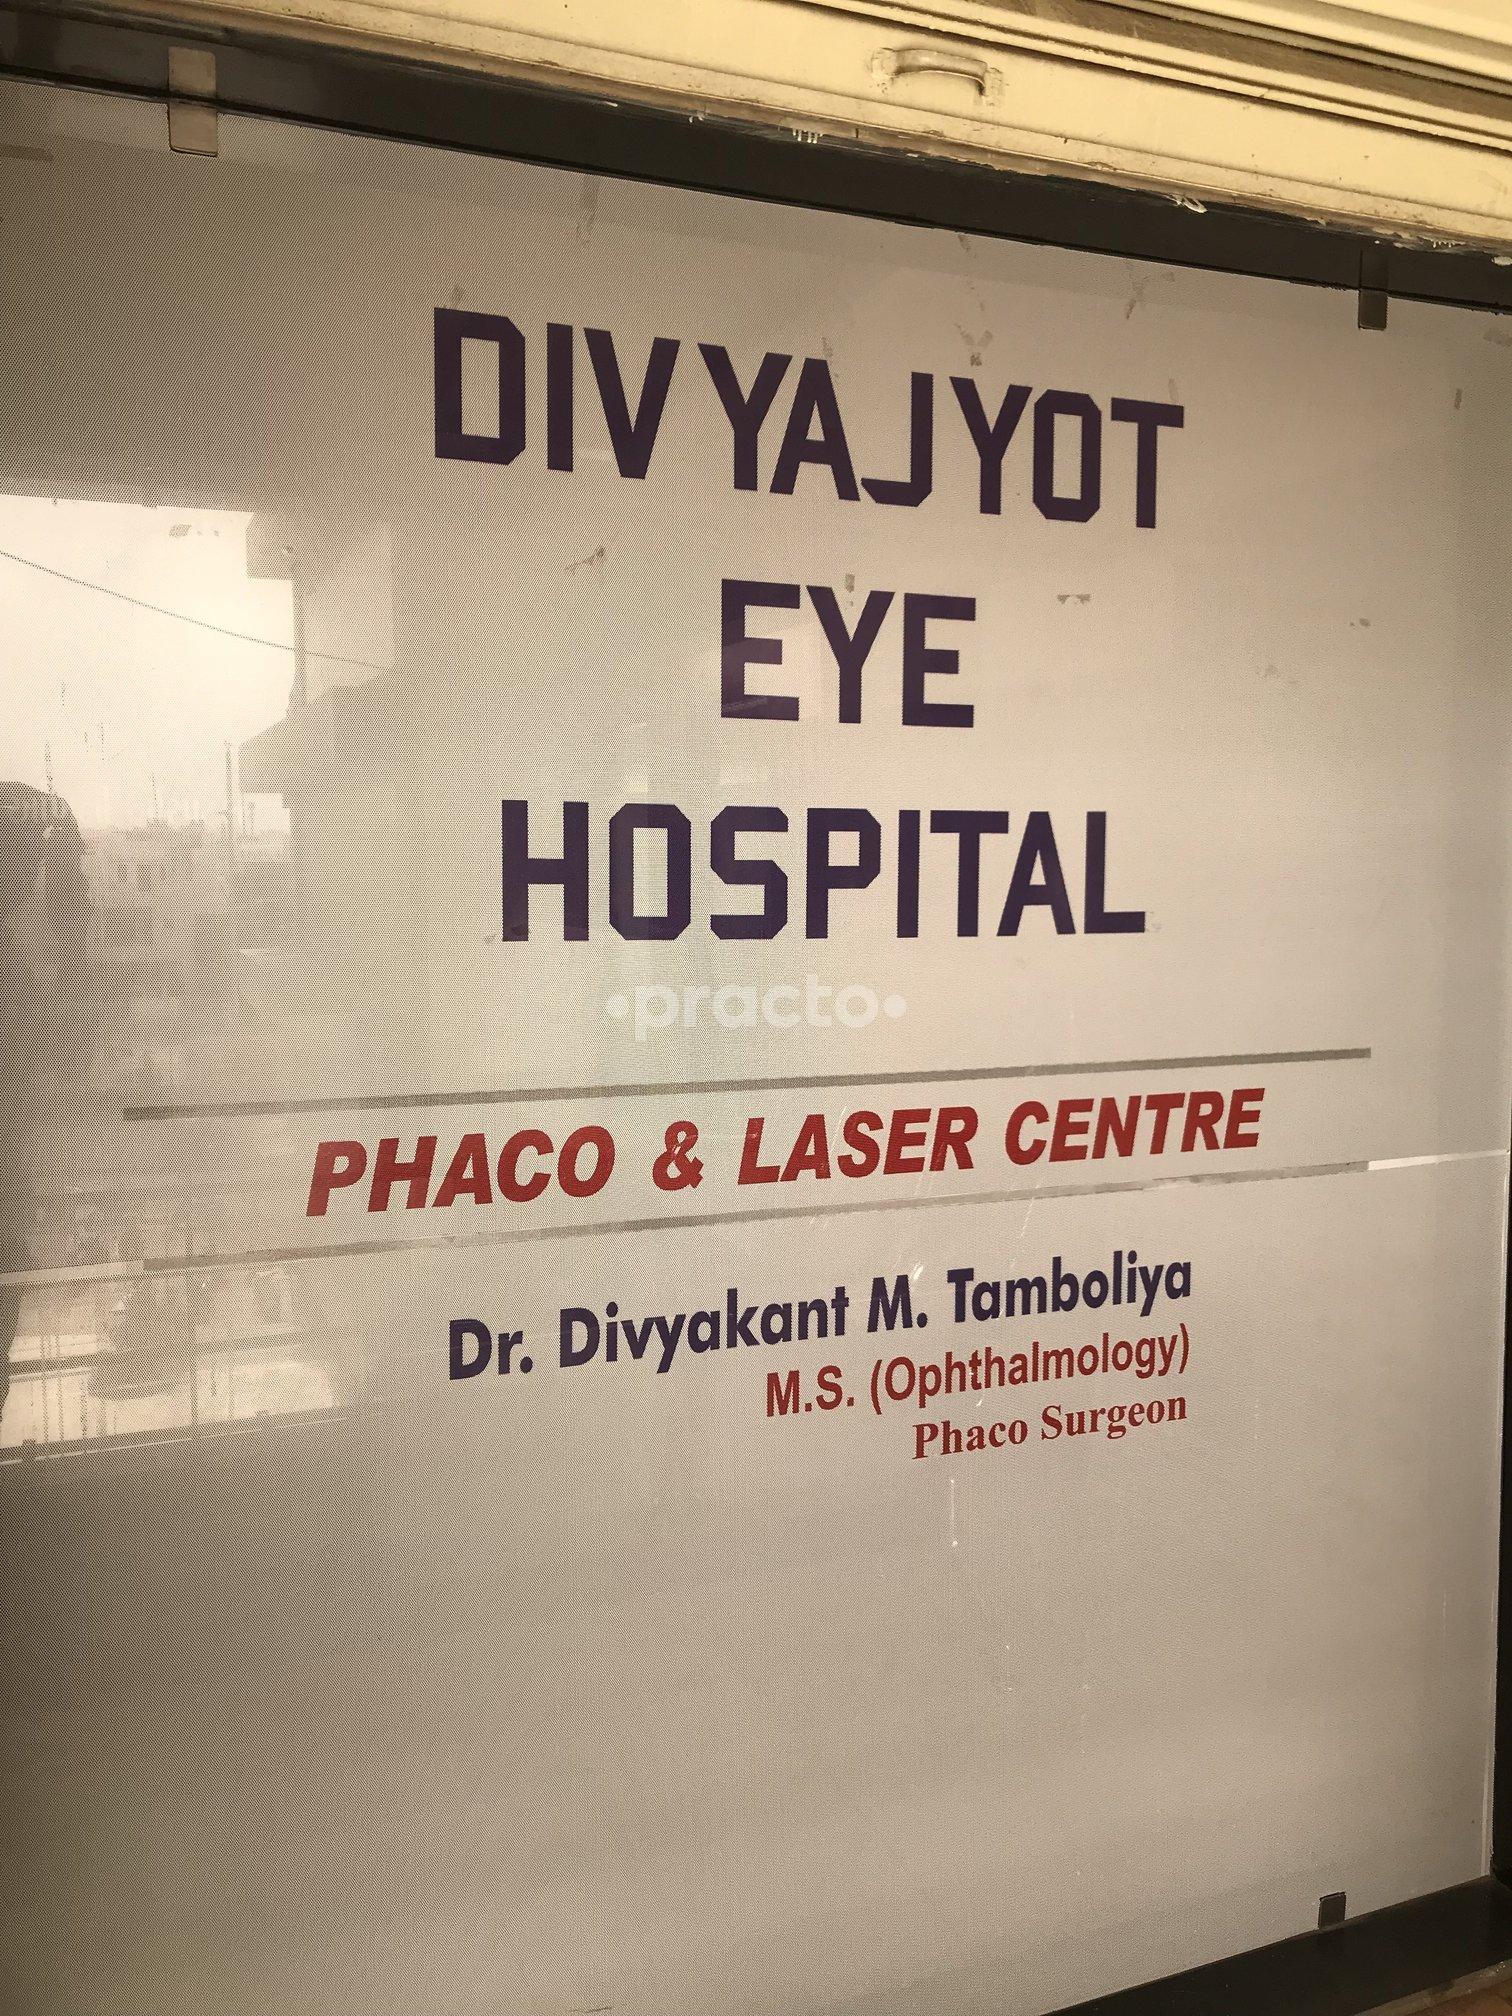 Divyajyot Eye Hospital